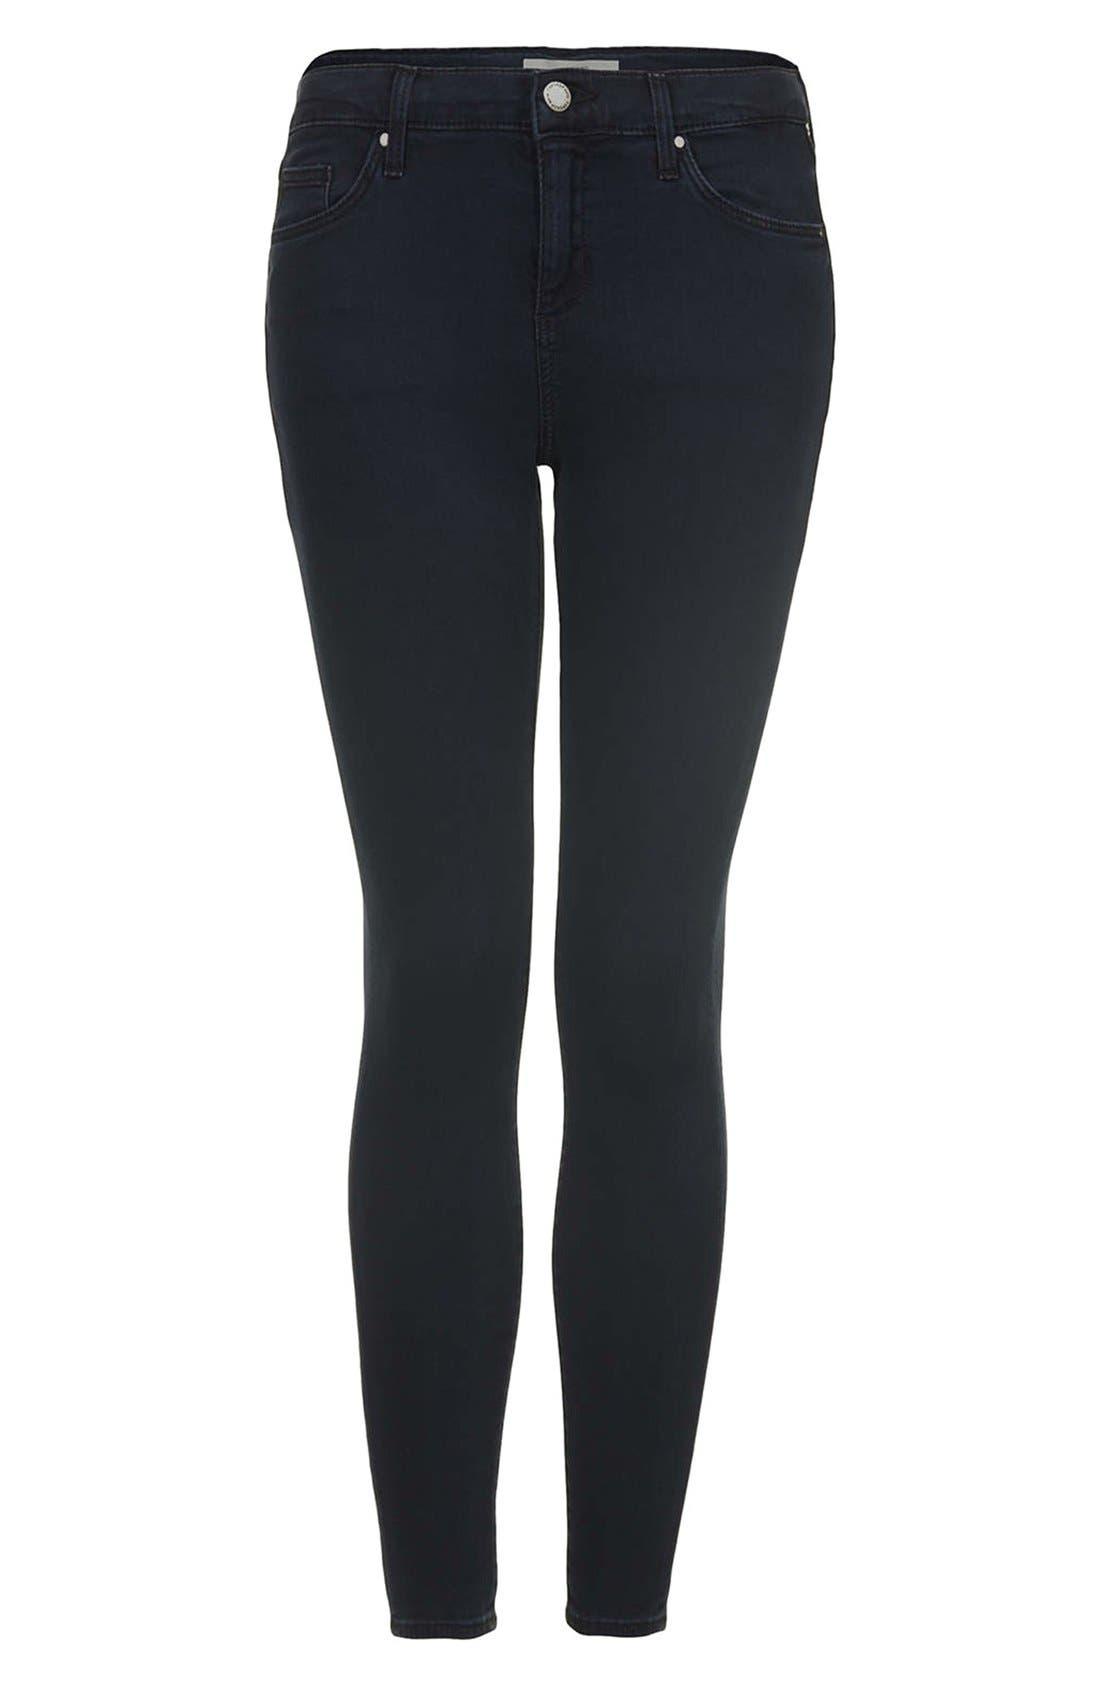 Alternate Image 3  - Topshop Moto 'Leigh' Crop Skinny Jeans (Blue Black) (Regular, Short & Long)